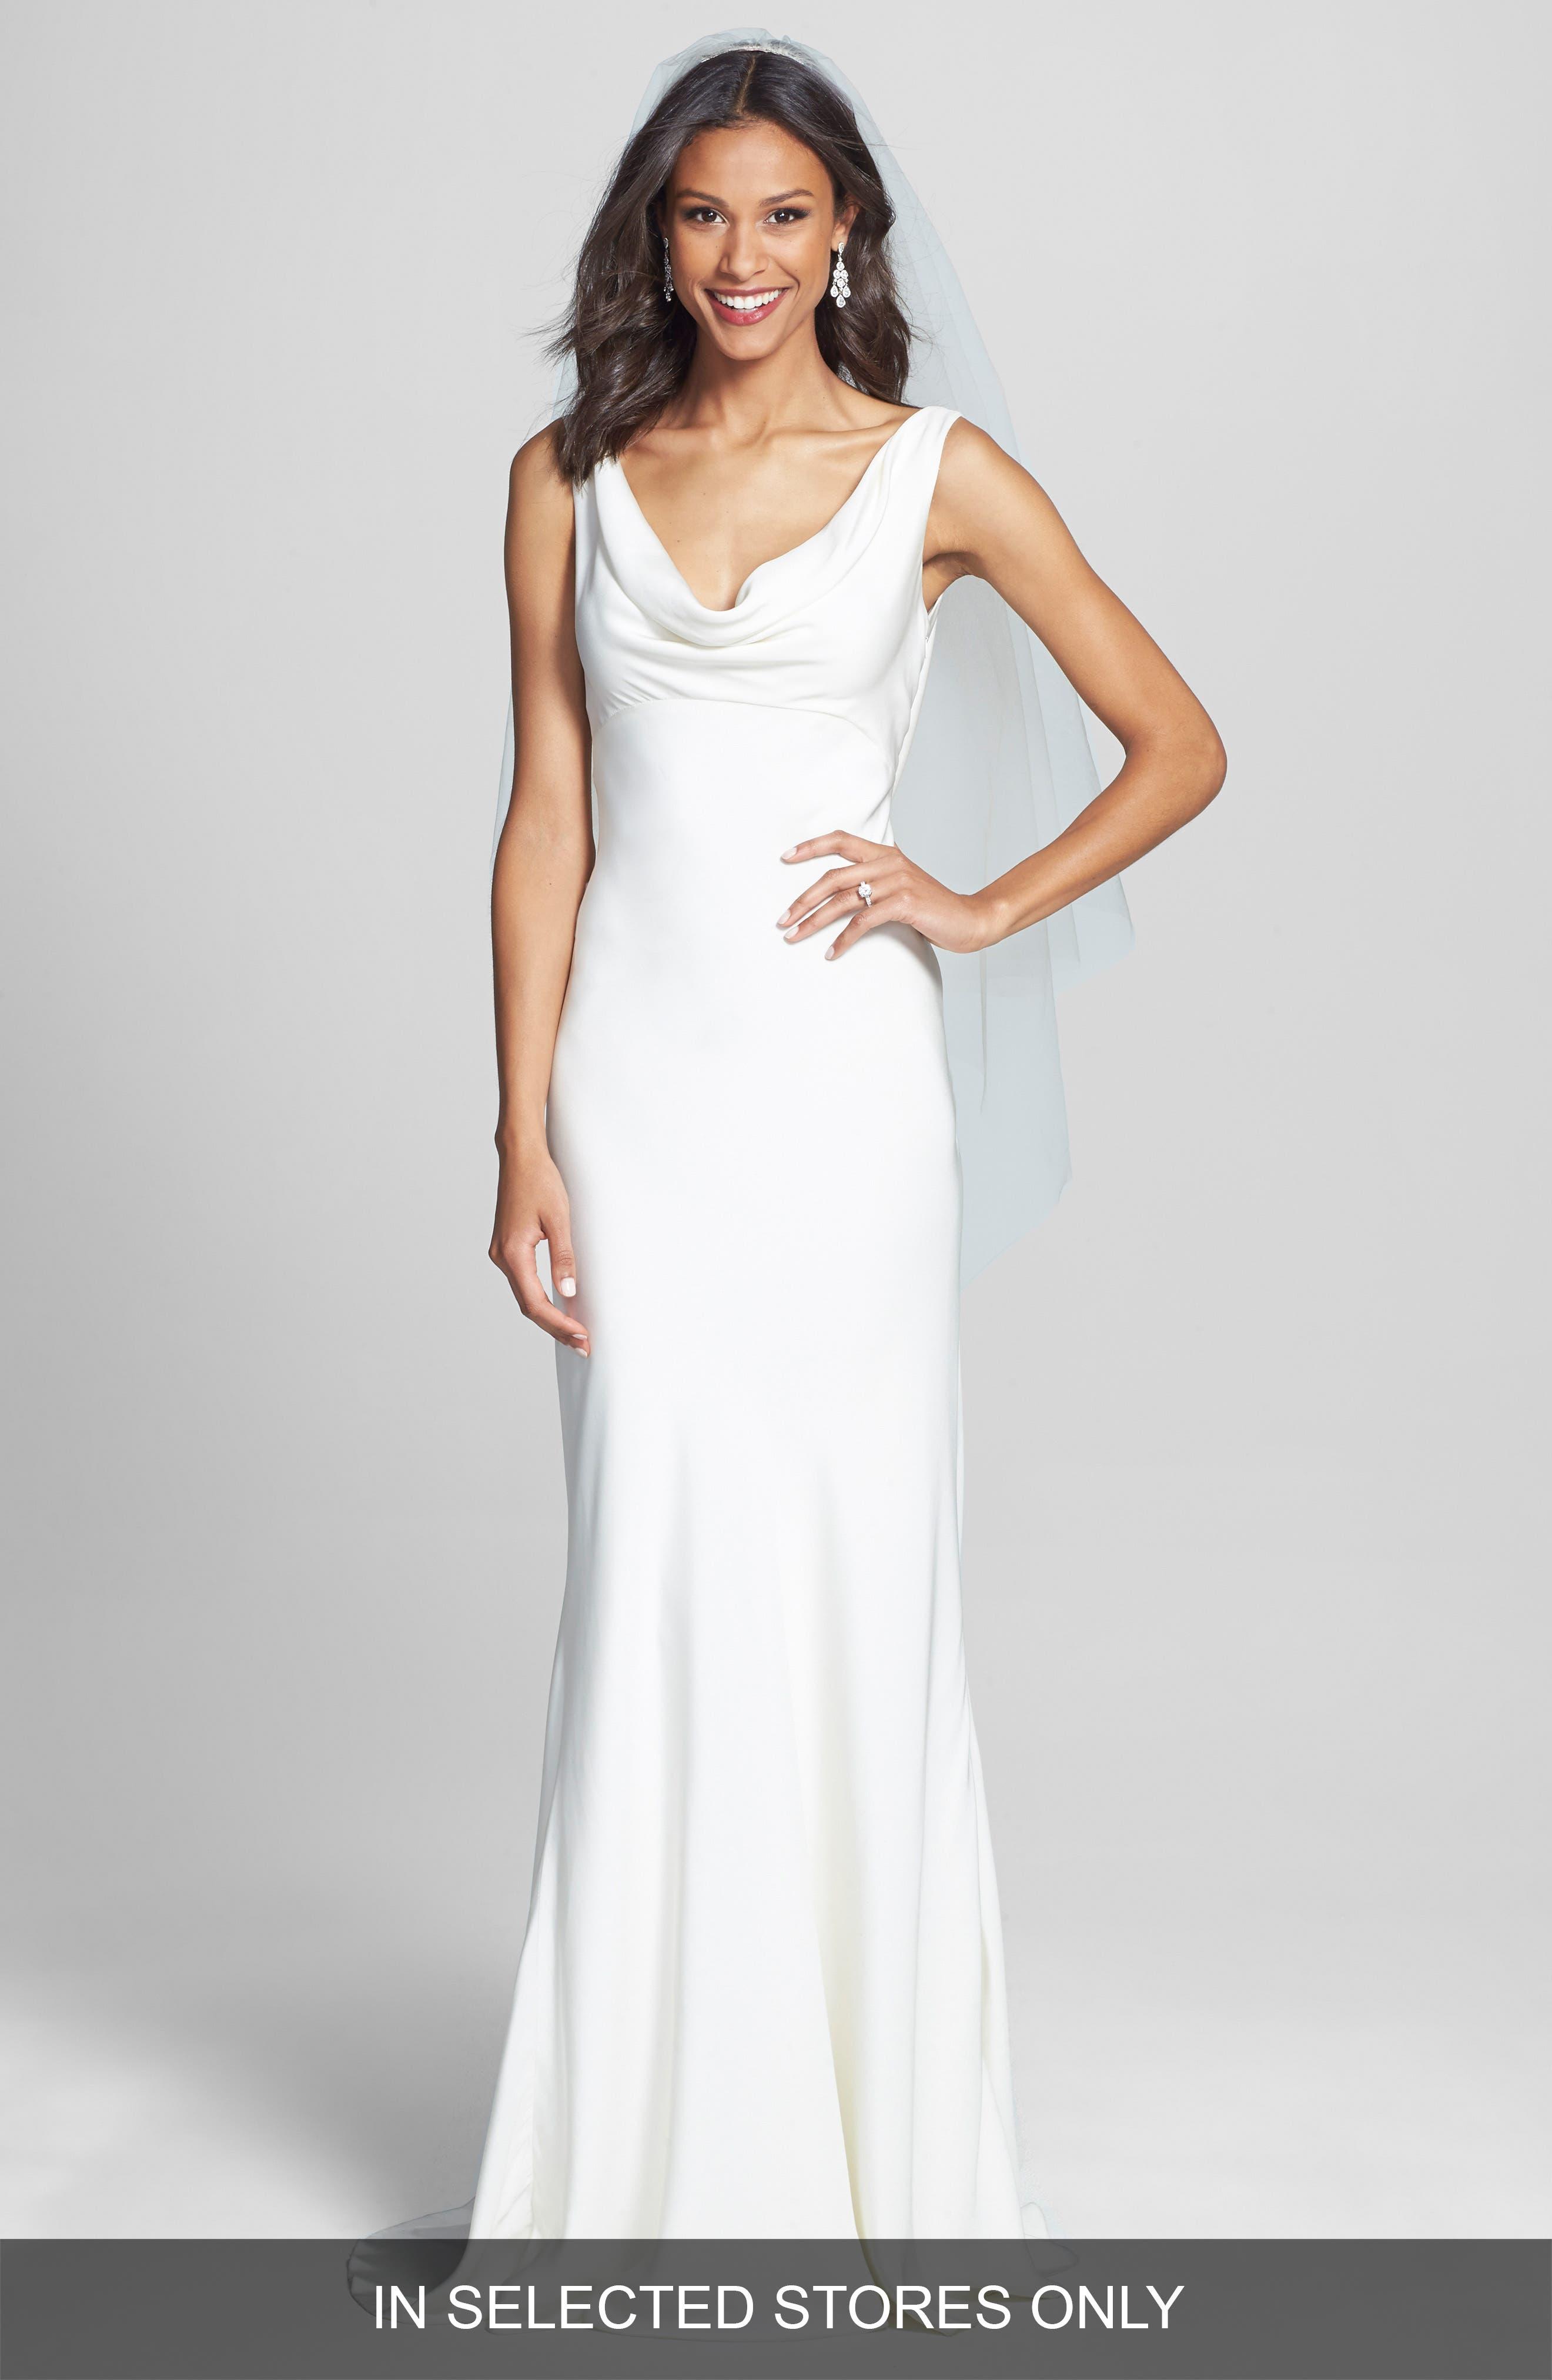 BLISS Monique Lhuillier Draped Neck Silk Crepe Wedding Dress